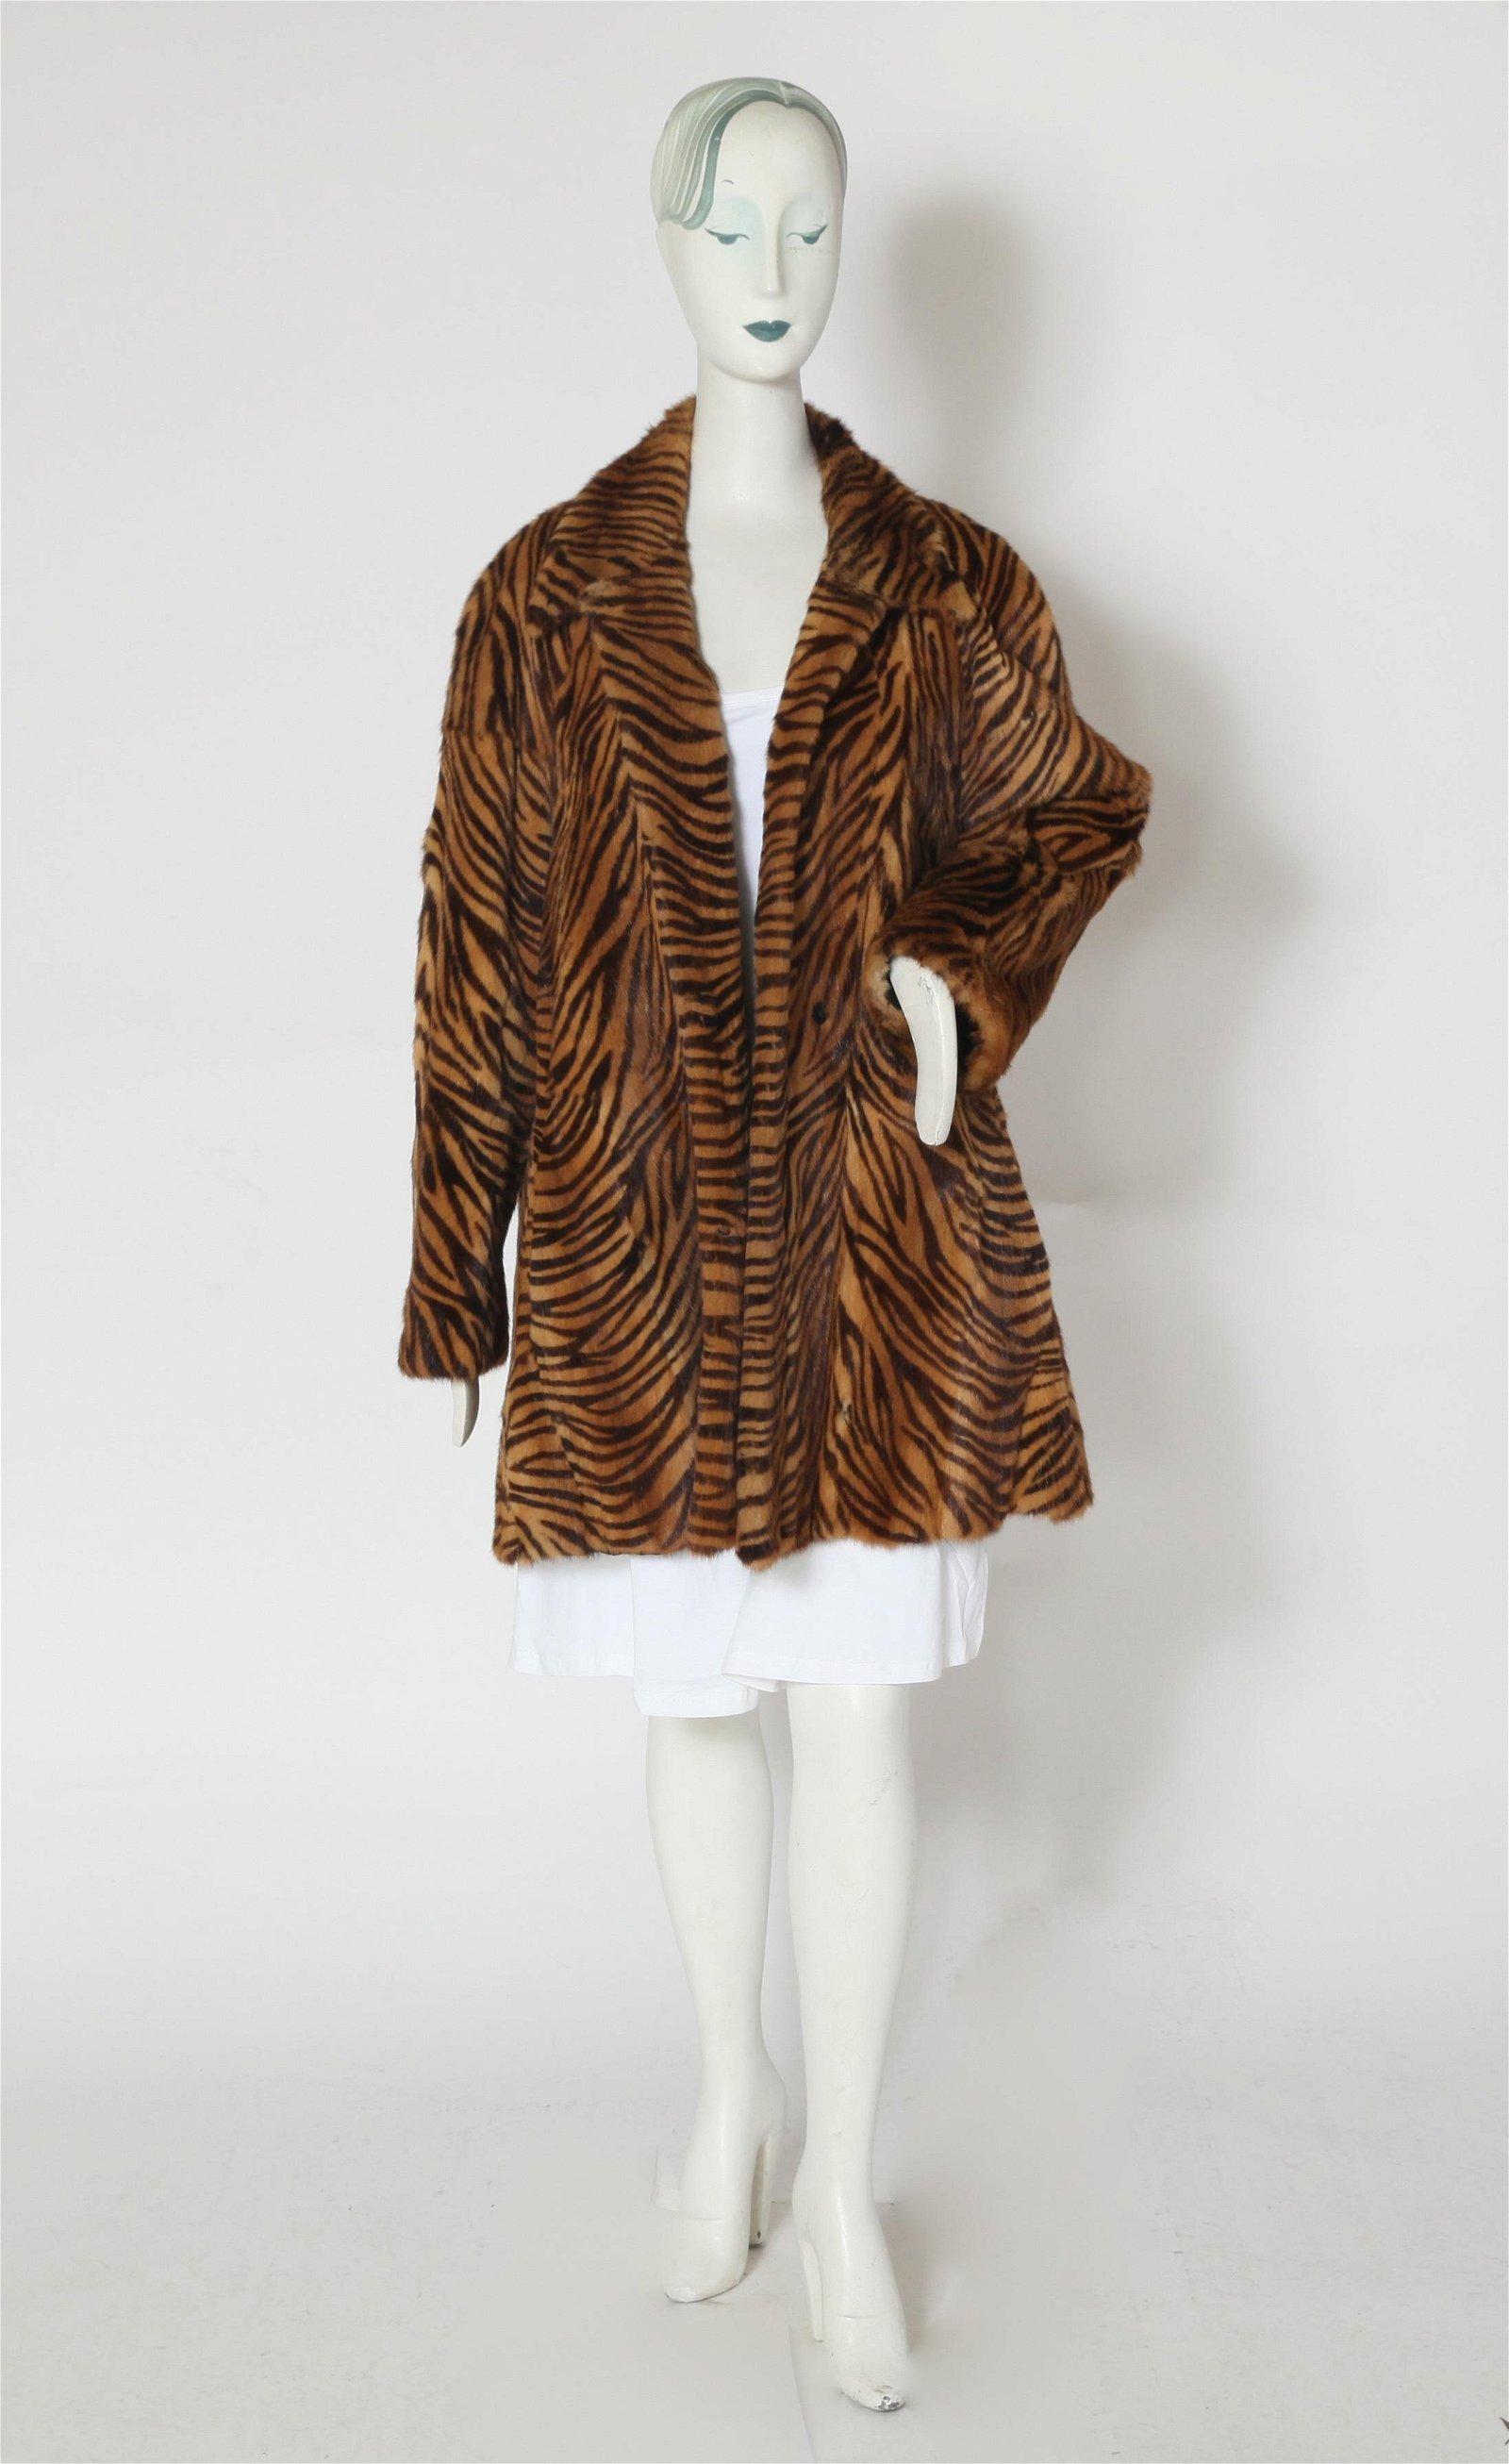 Stenciled Tiger Stripe Fur Coat